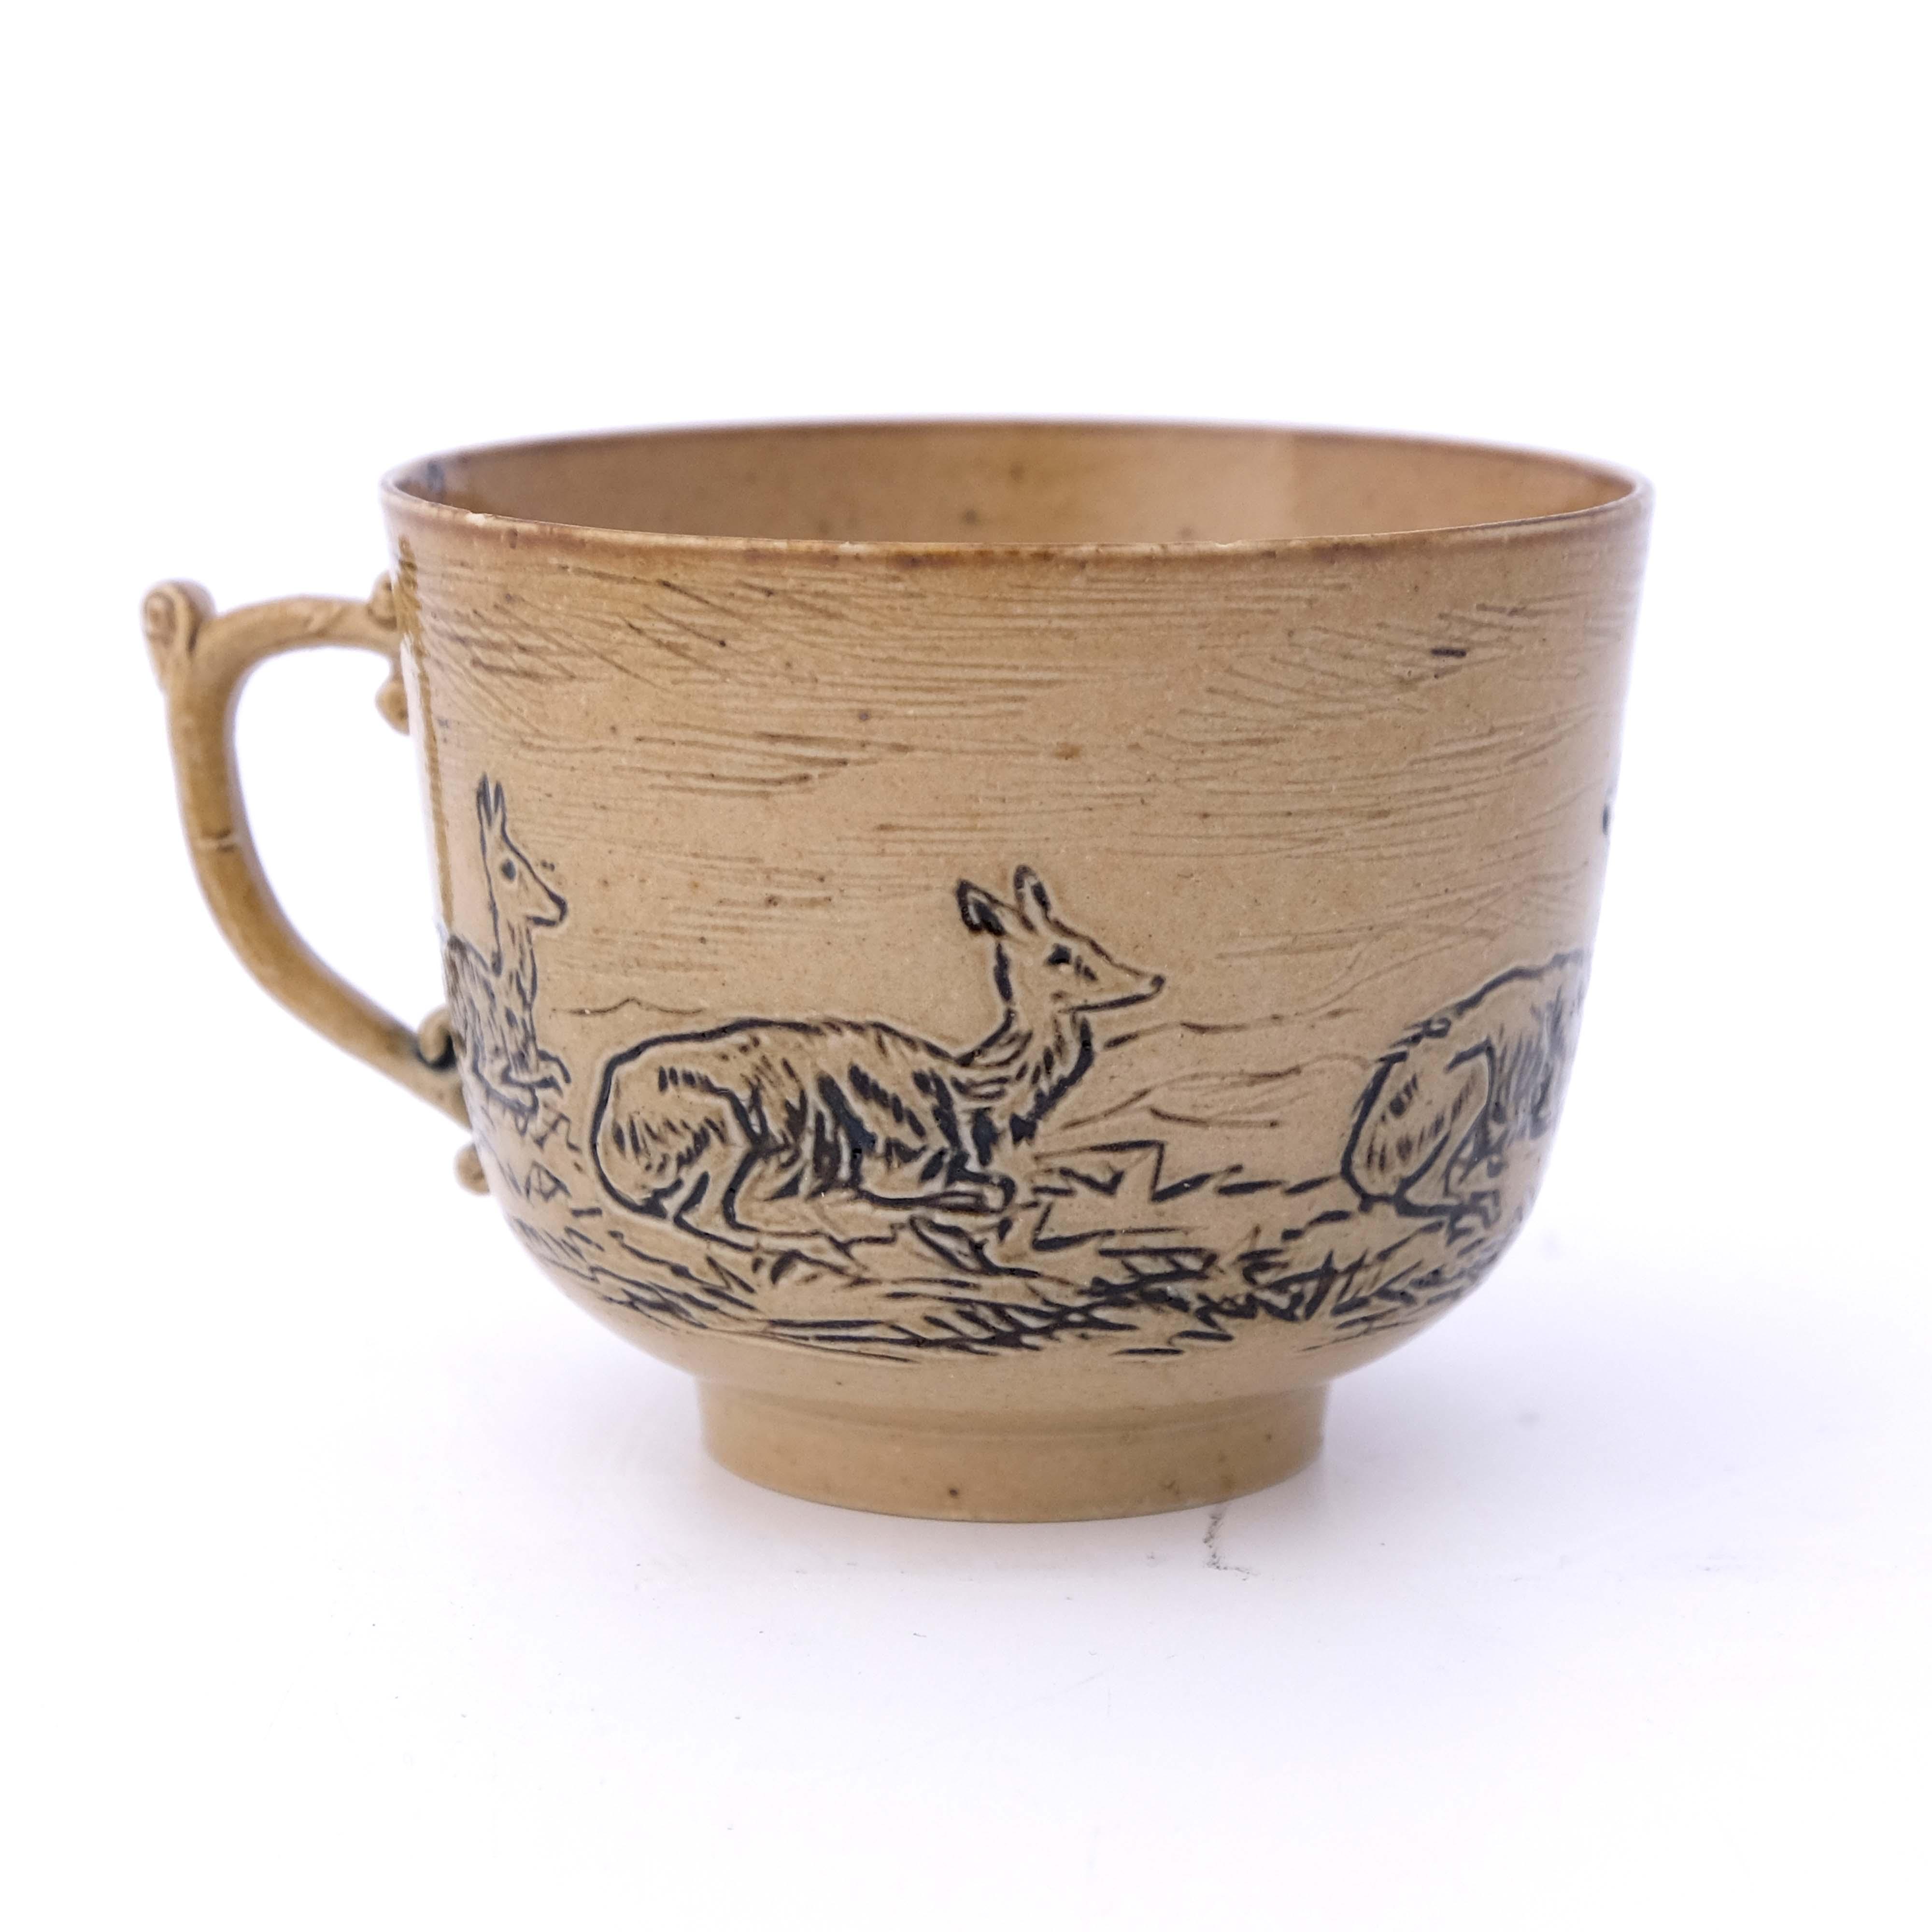 Hannah Barlow for Doulton Lambeth, a stoneware cof - Image 2 of 5